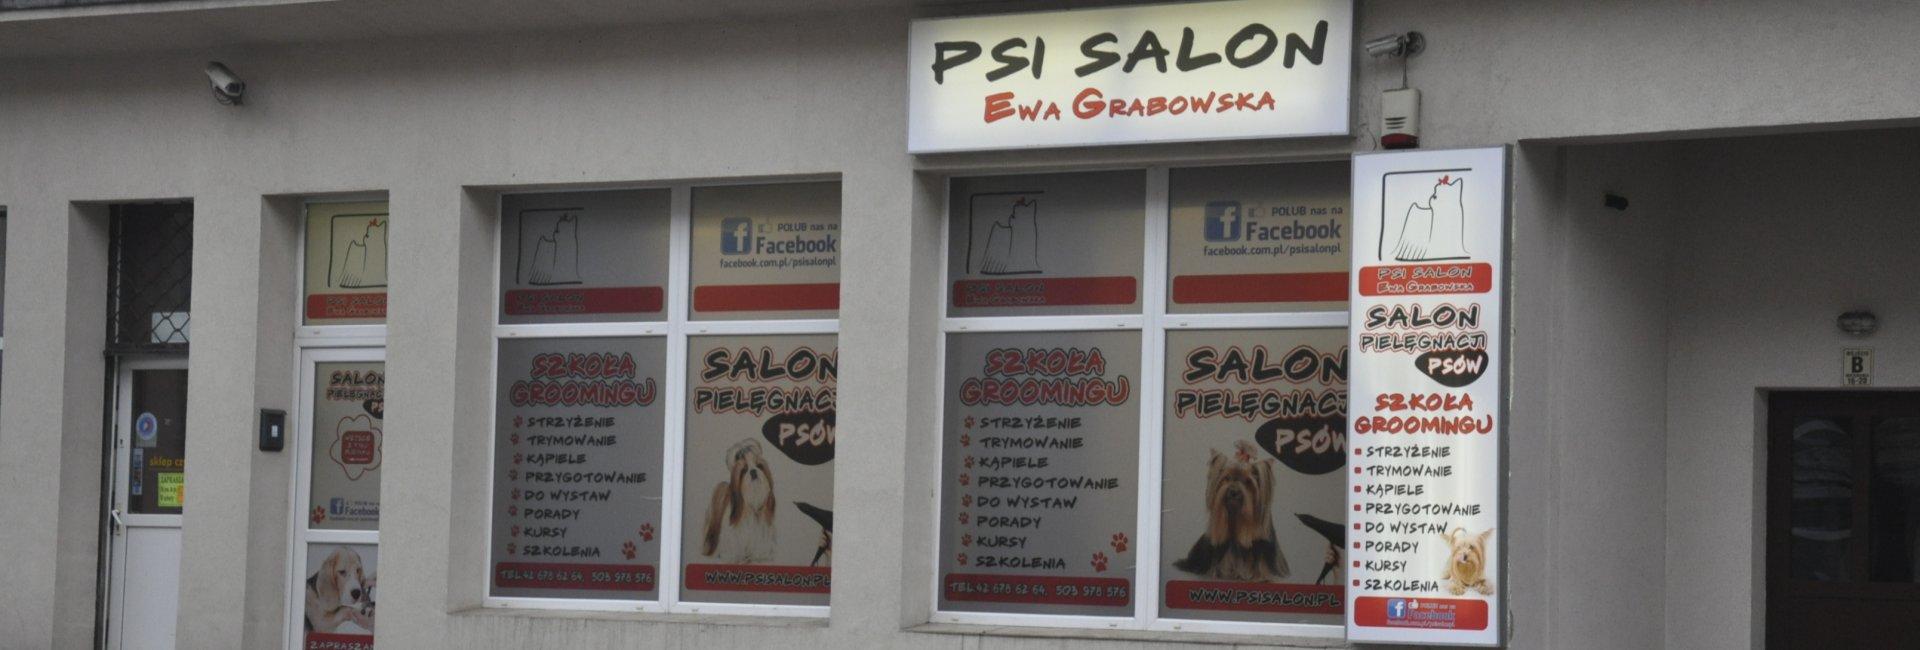 Psi Salon Szkoła Groomingu Ewa Grabowska Szkoła Groomingu